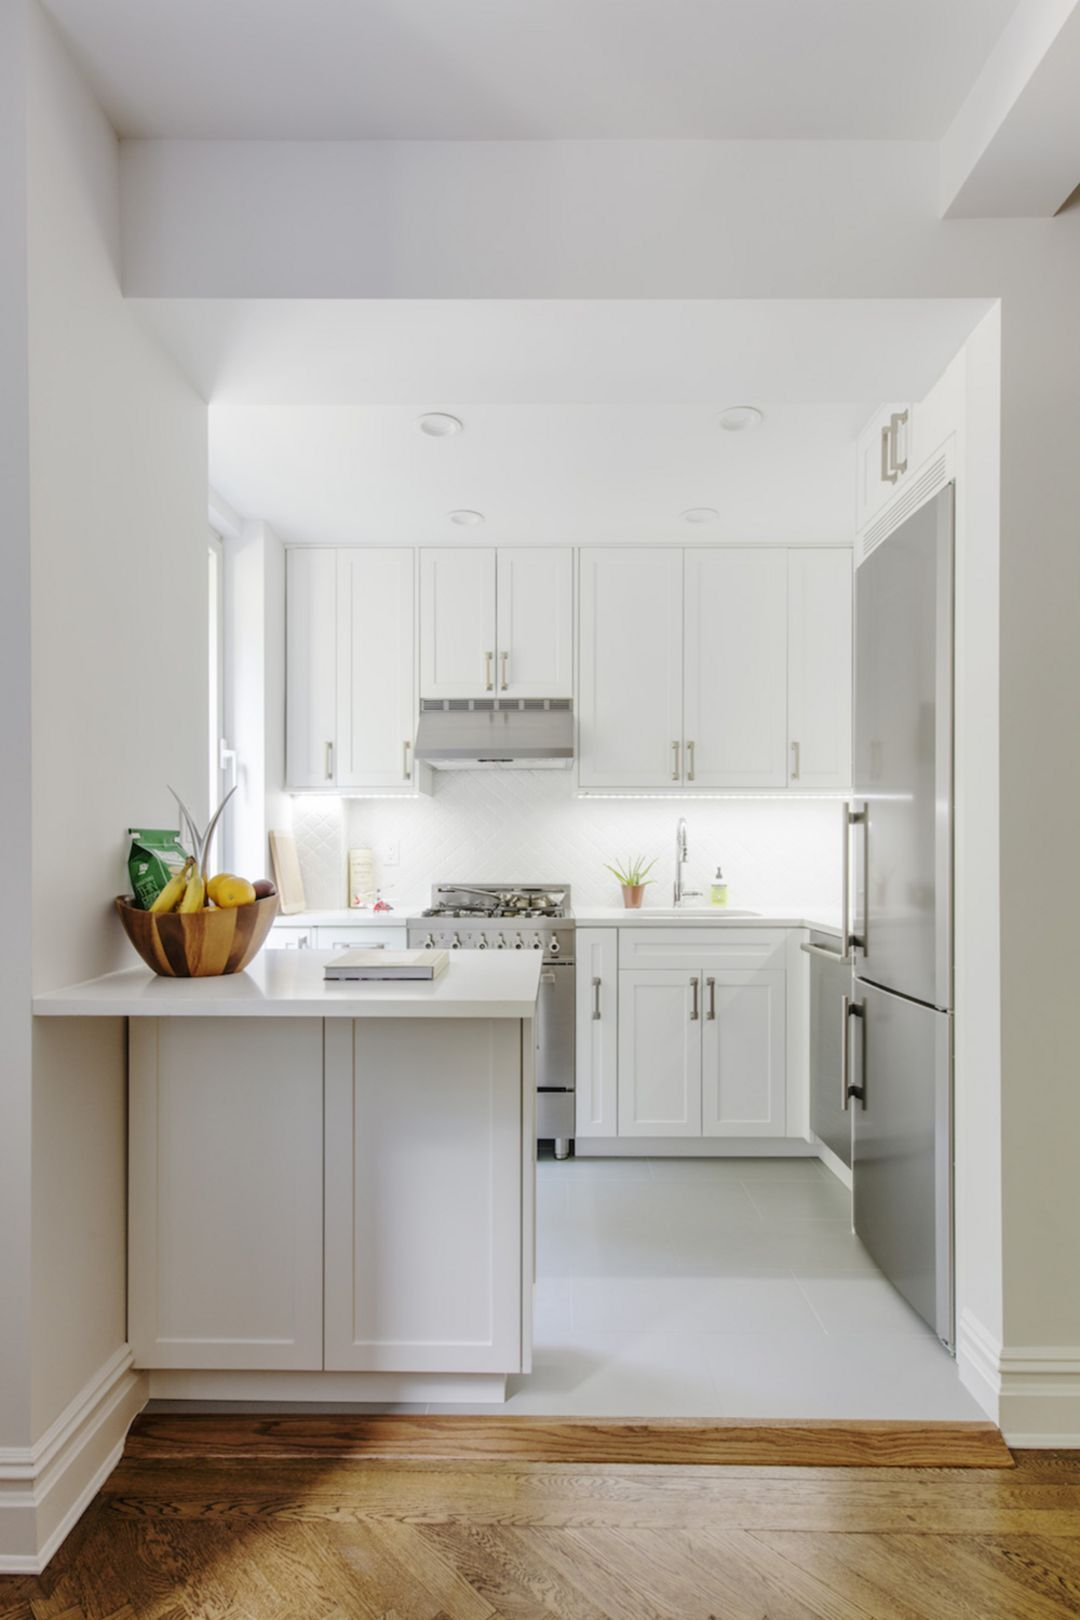 f72592cef6b18effd919057d86b2e2ad - View Low Budget Small House Modern Kitchen Design Pics